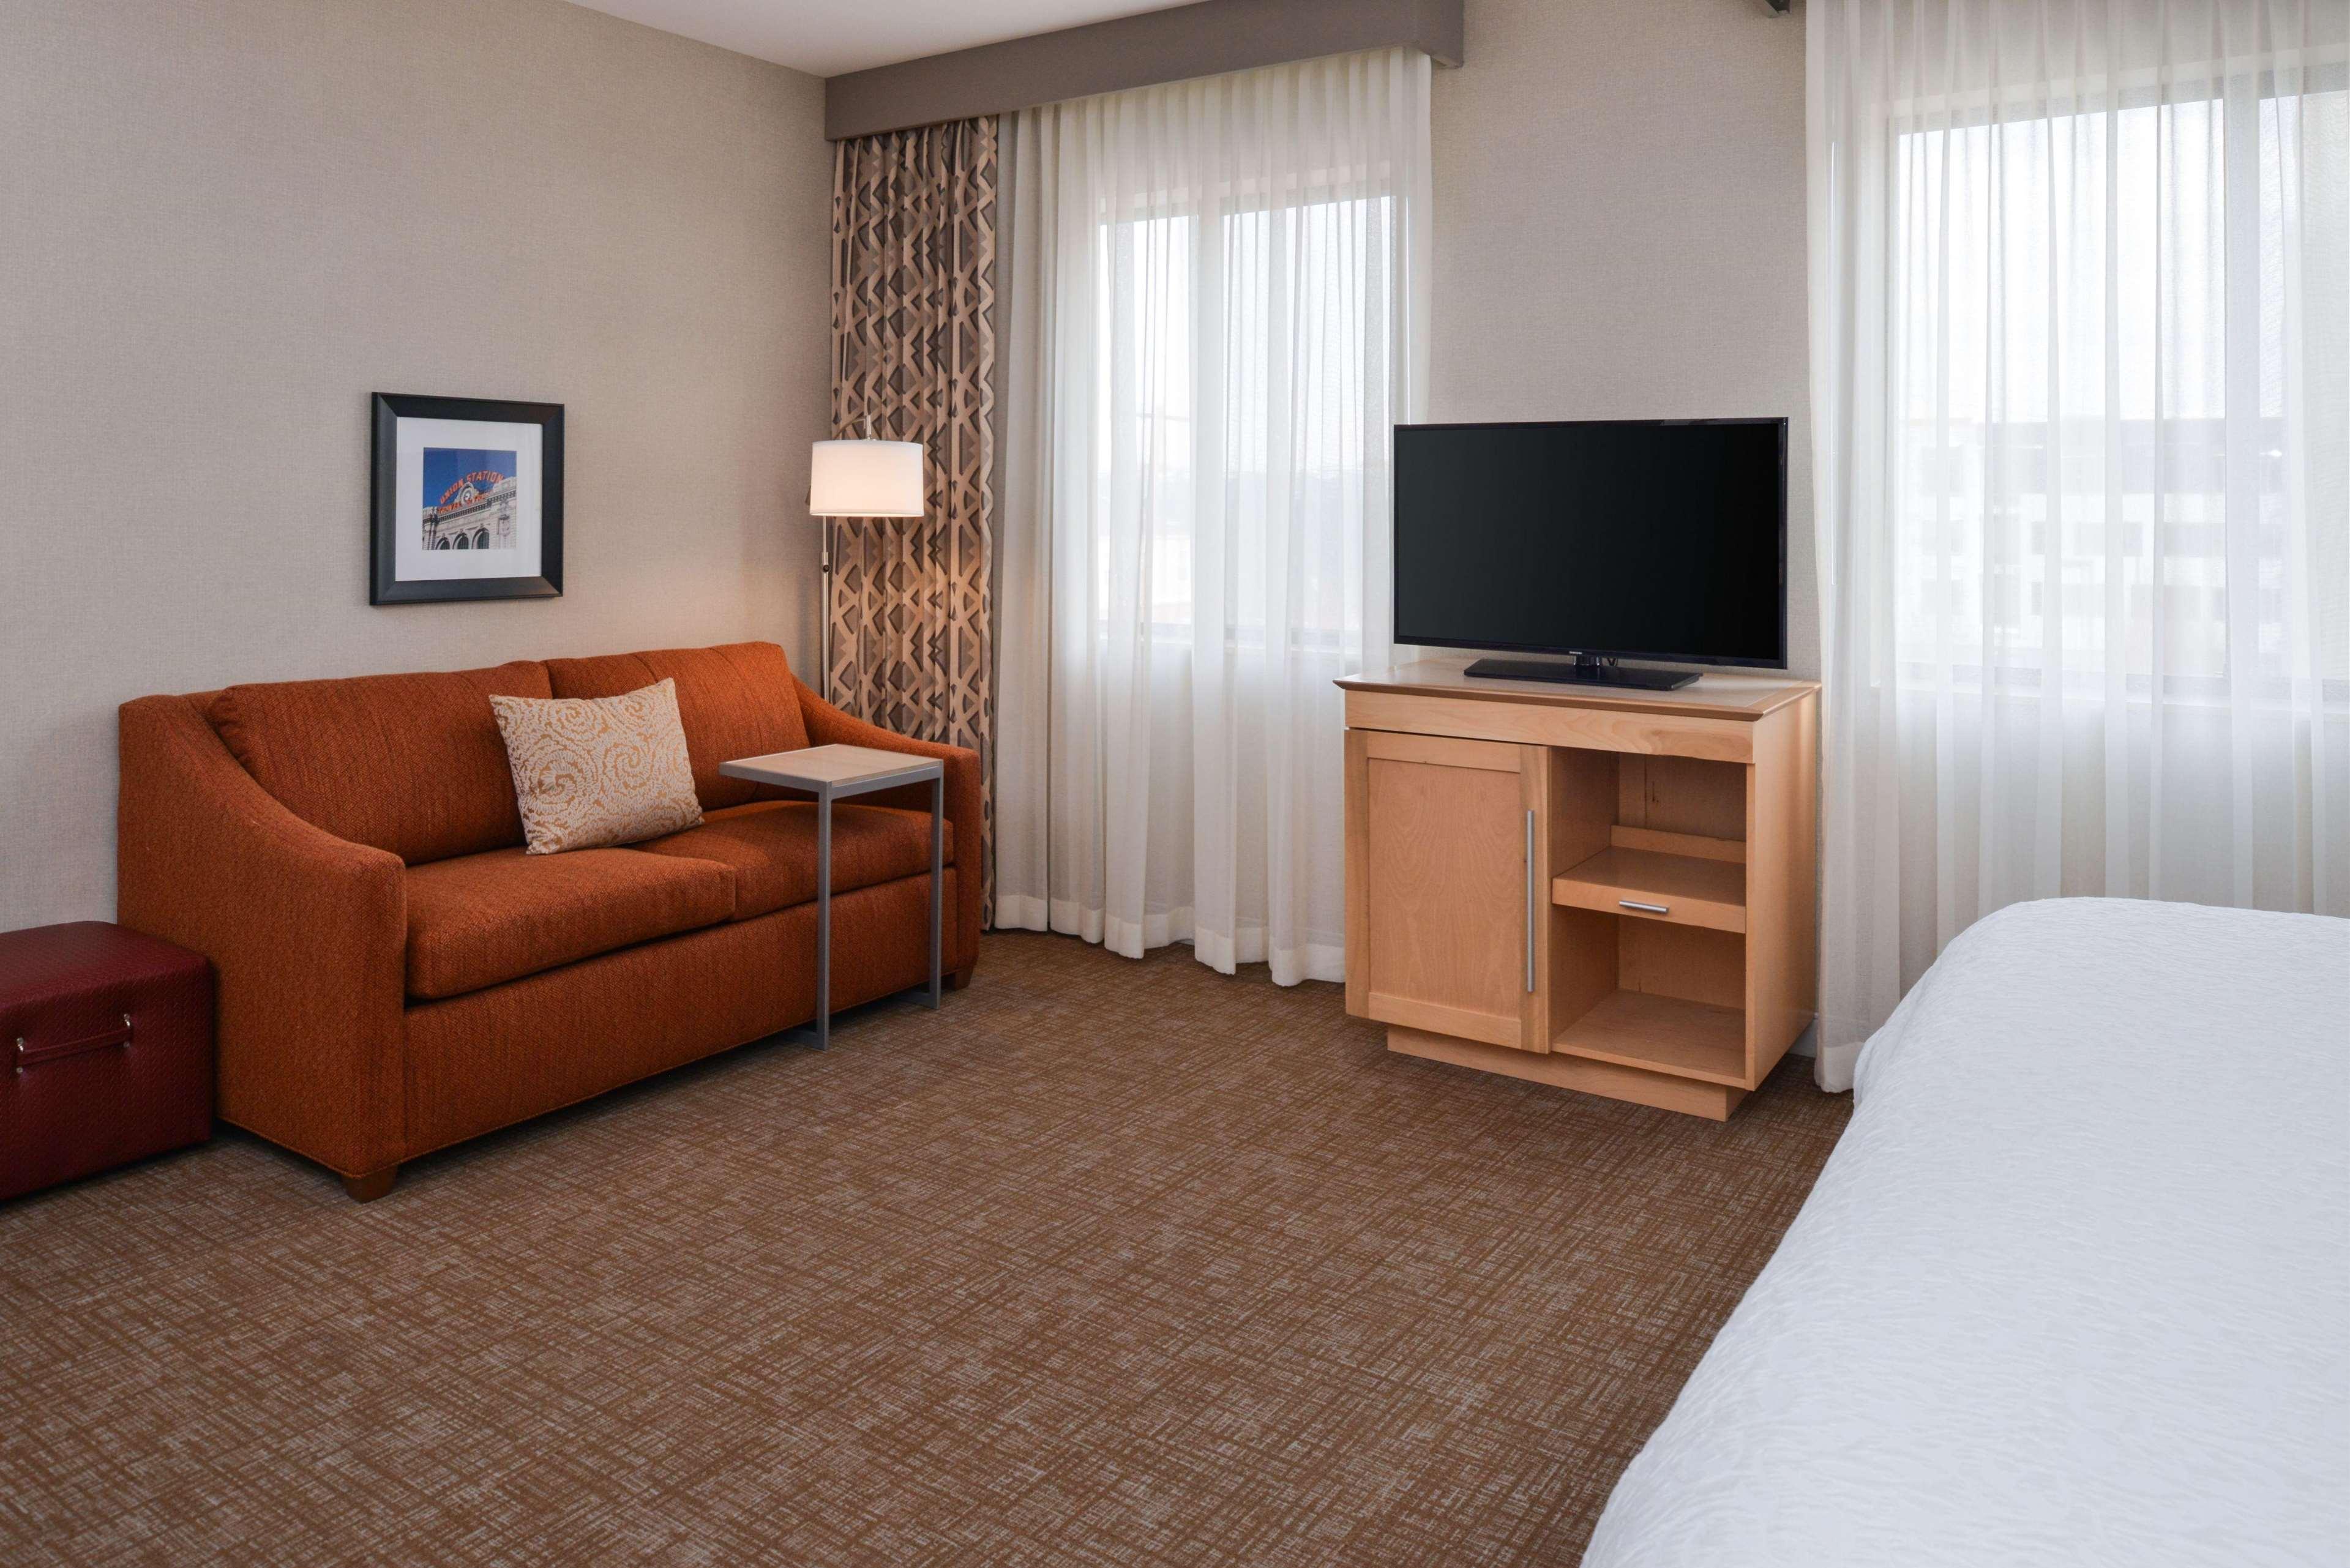 Hampton Inn & Suites Denver-Speer Boulevard image 33